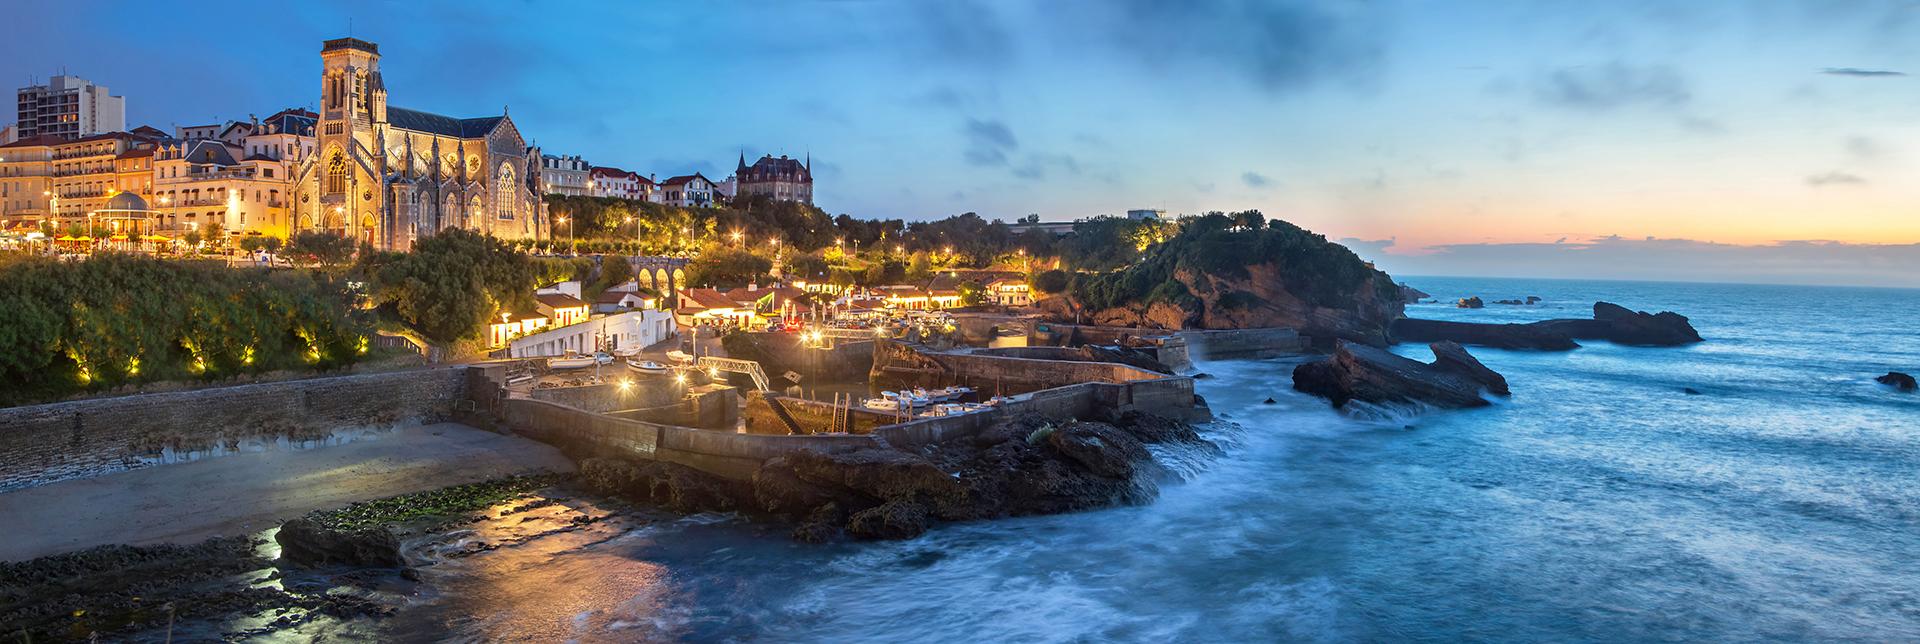 à Biarritz | Chez Albert